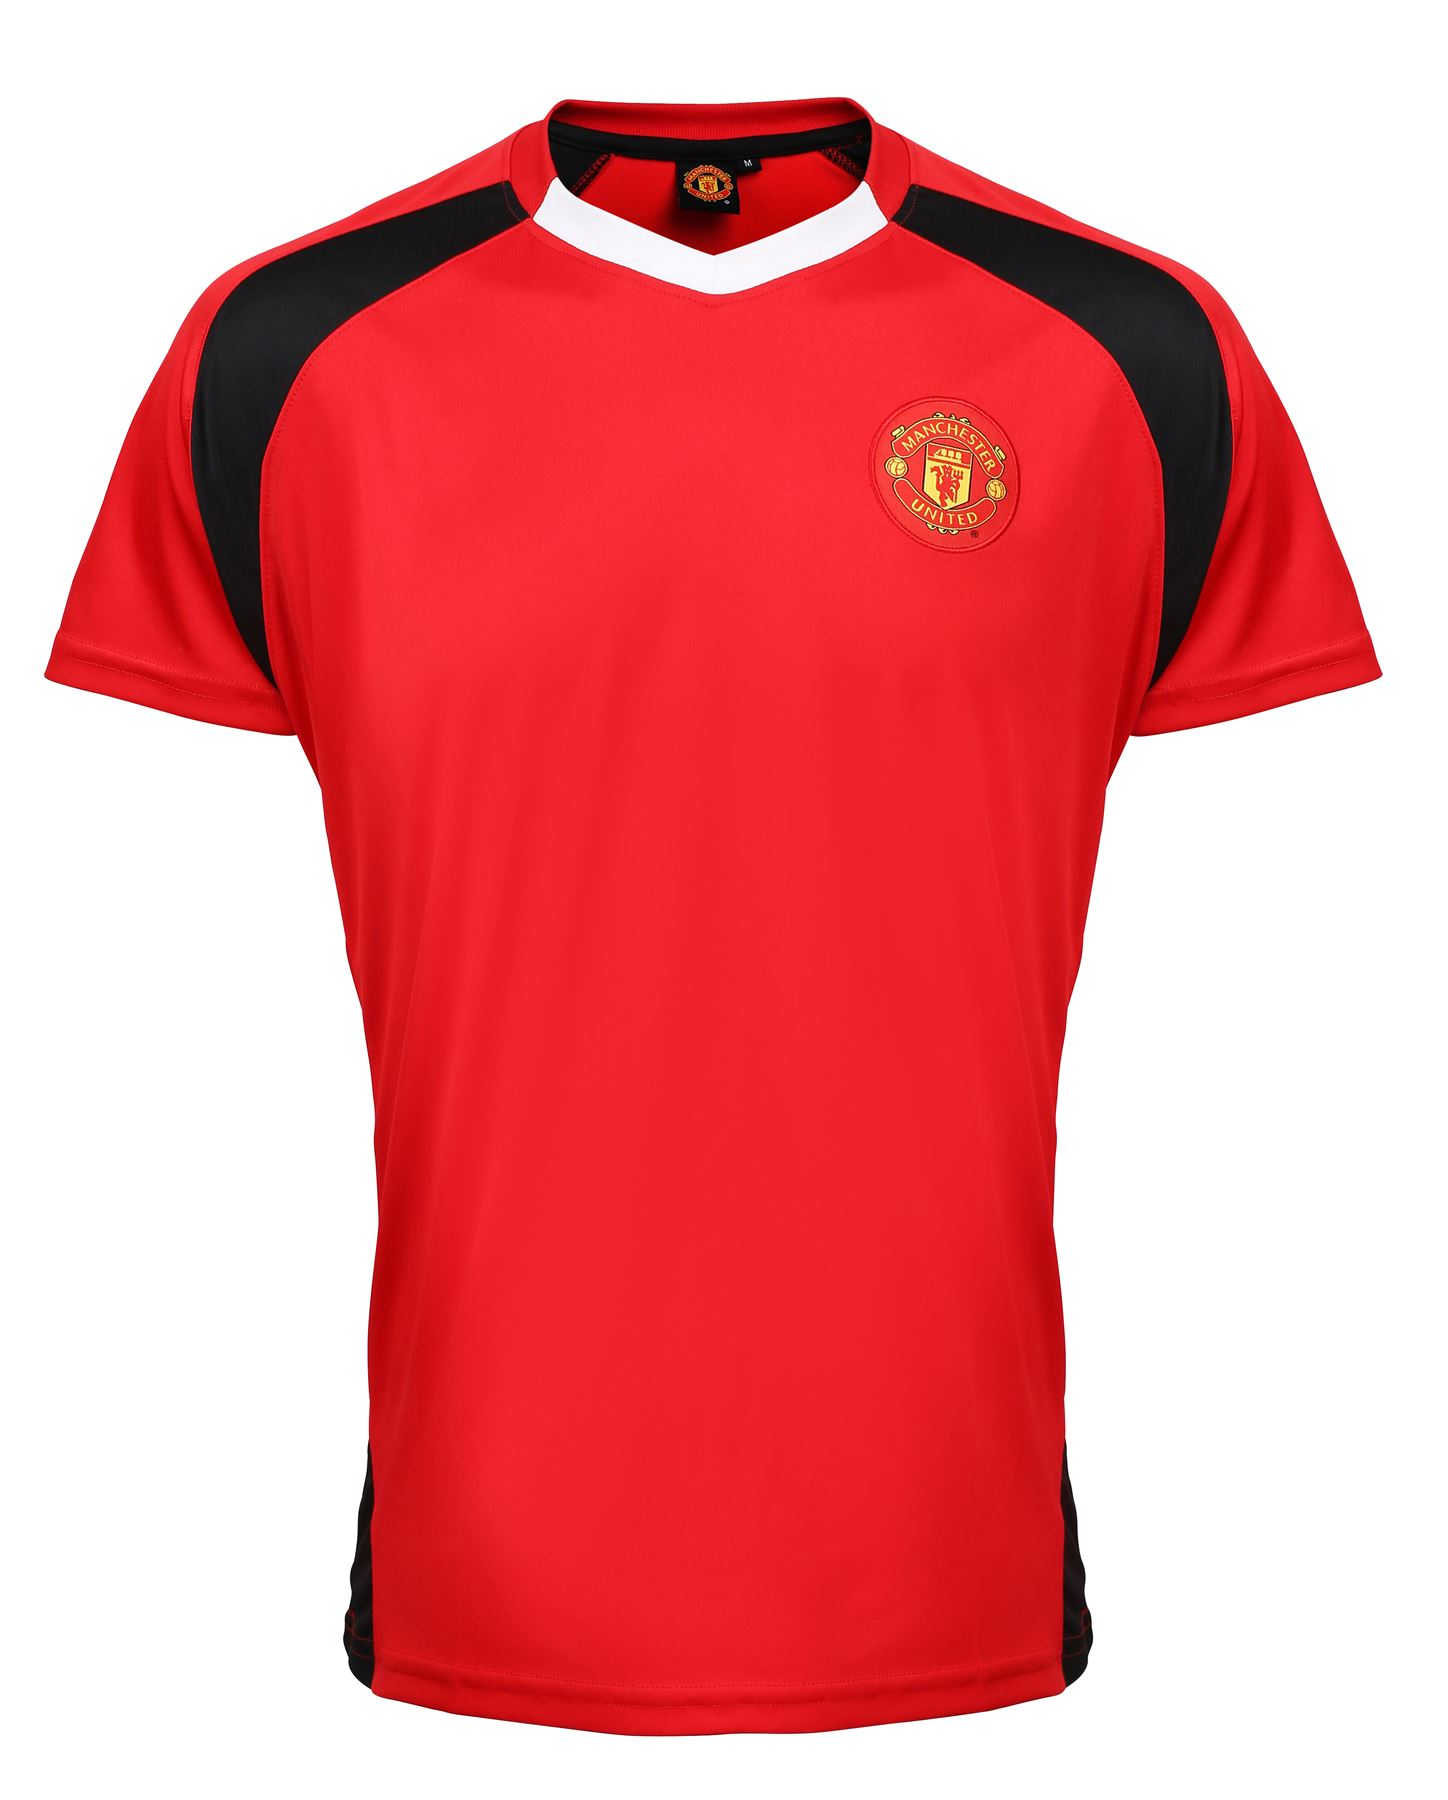 367e90c3d17 Manchester United Signed Shirts Ebay